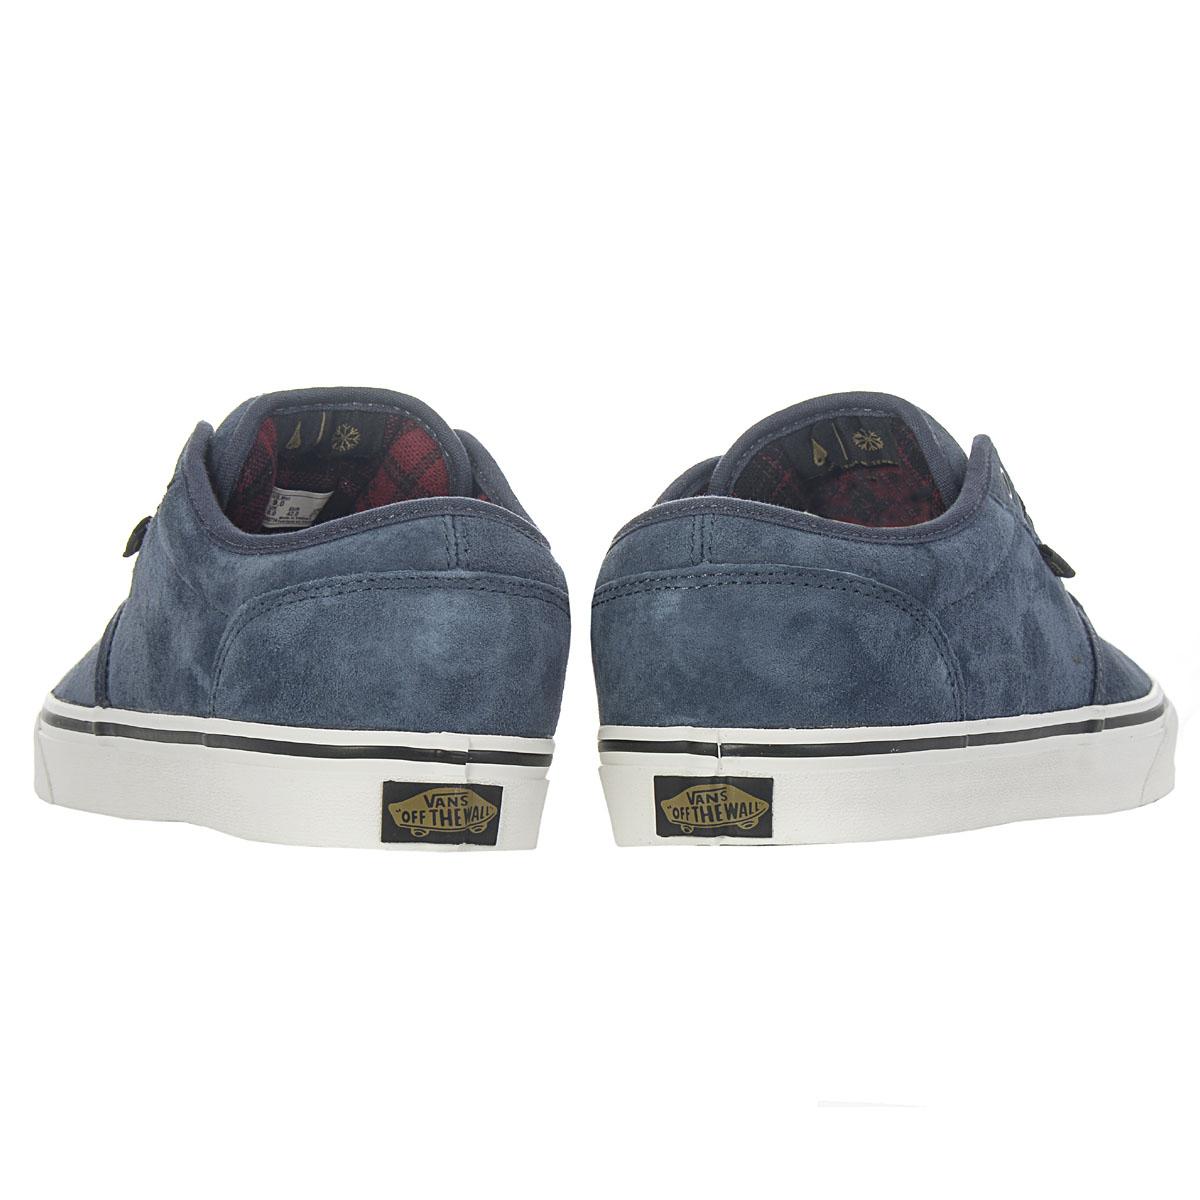 NEU Vans Atwood Herren SALE Leder Schuhe Navy-Blau VN00015GK87 SALE Herren fc27d2